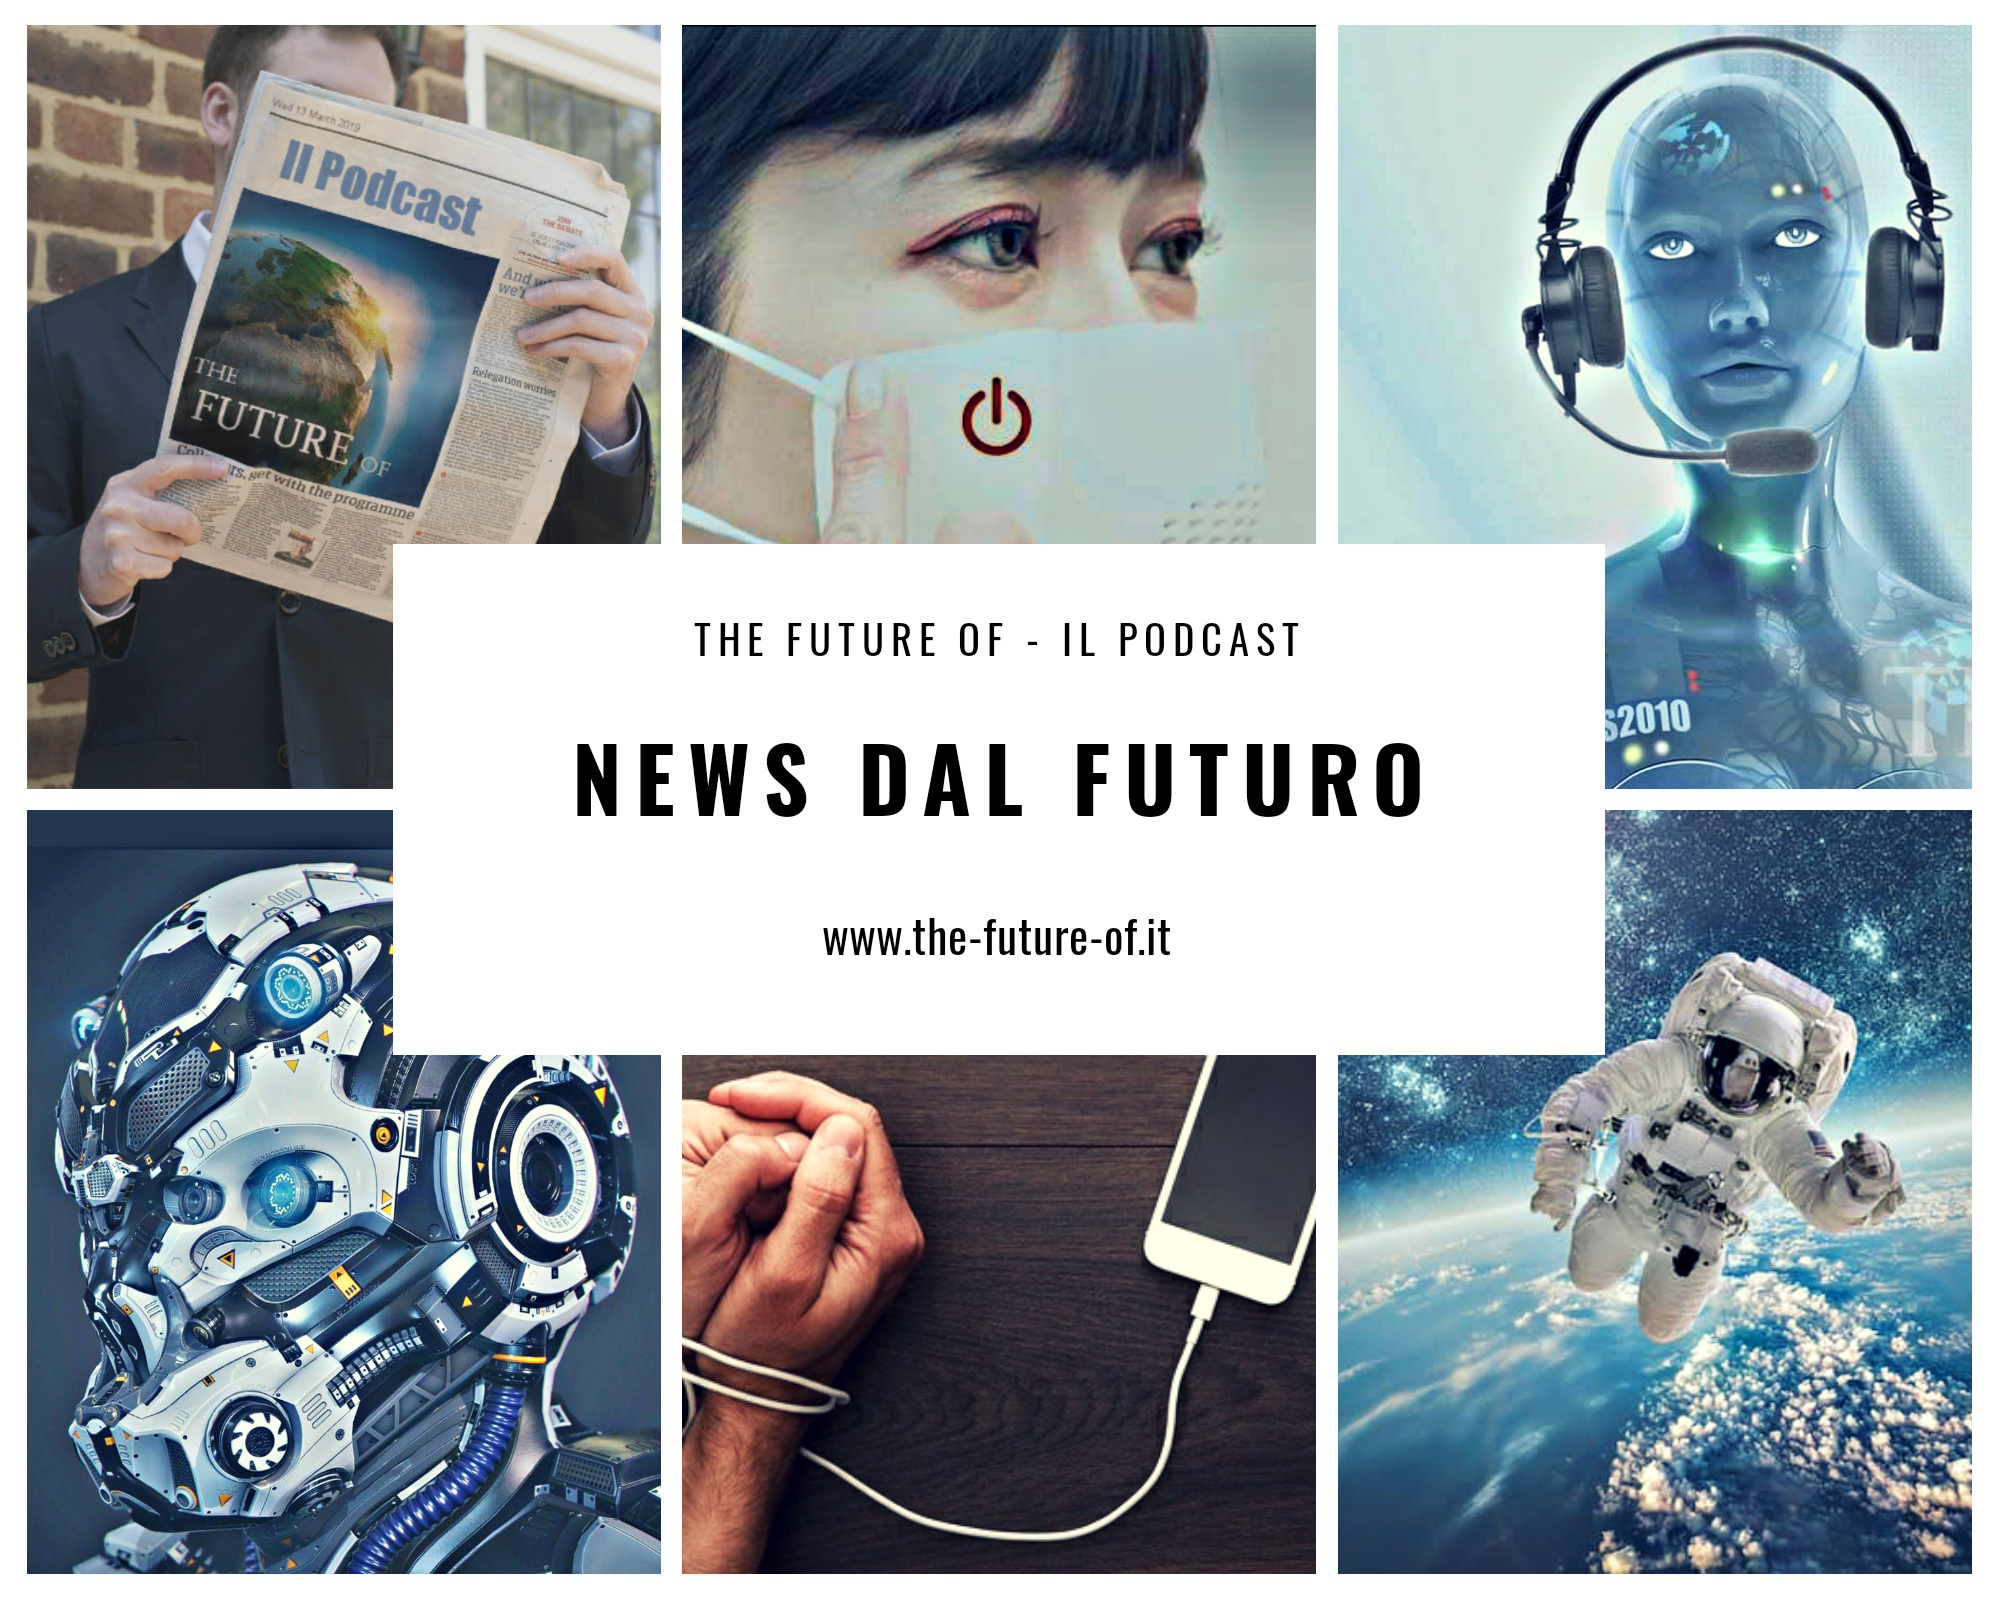 News dal futuro #70